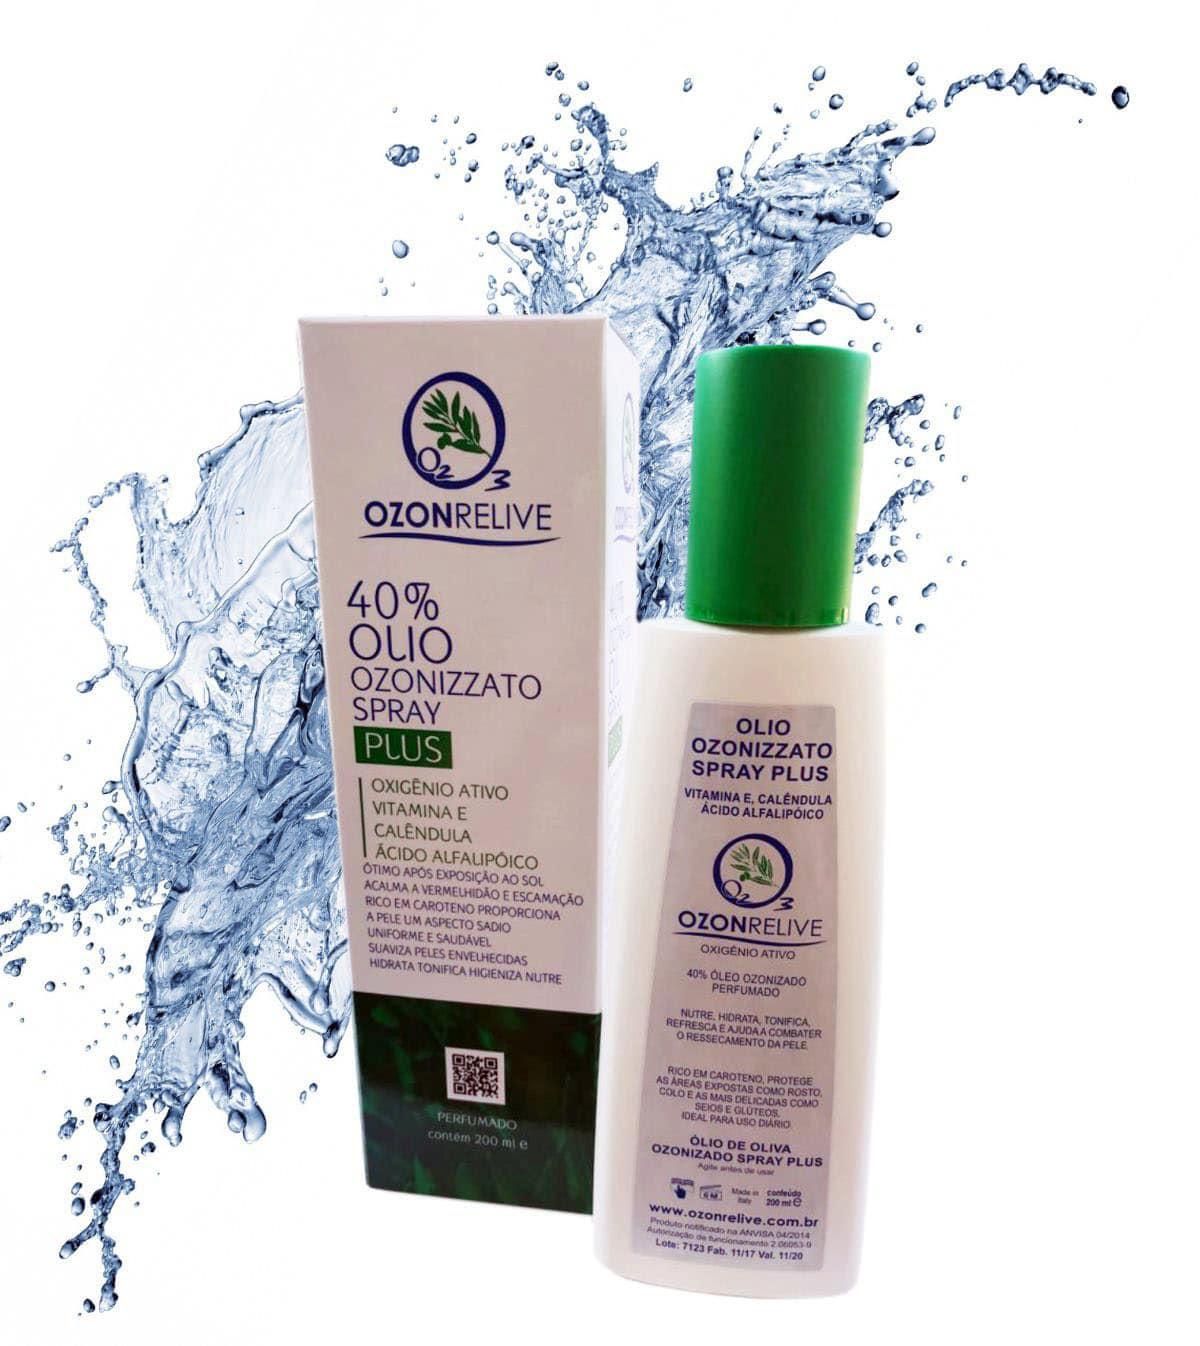 Olio Ozonizzato Spray Plus